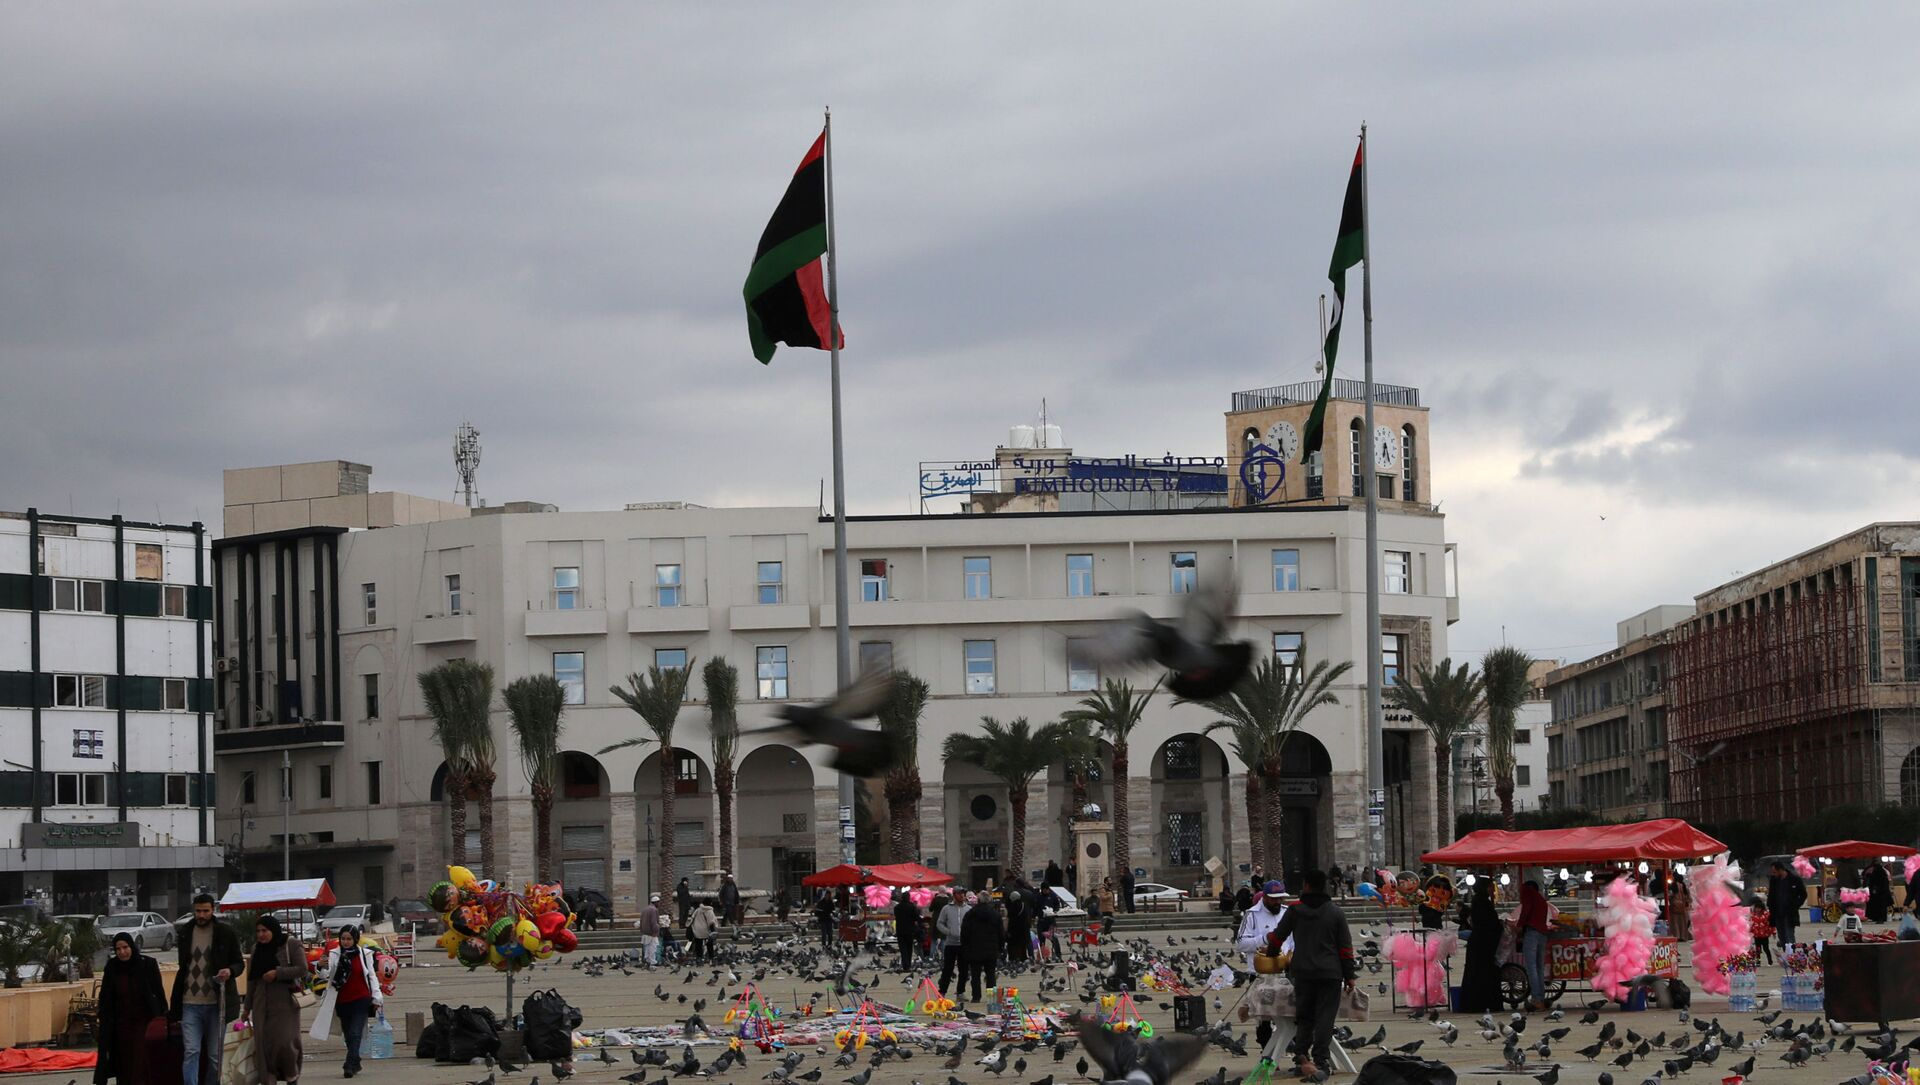 Trípoli, la capital de Libia - Sputnik Mundo, 1920, 10.02.2020